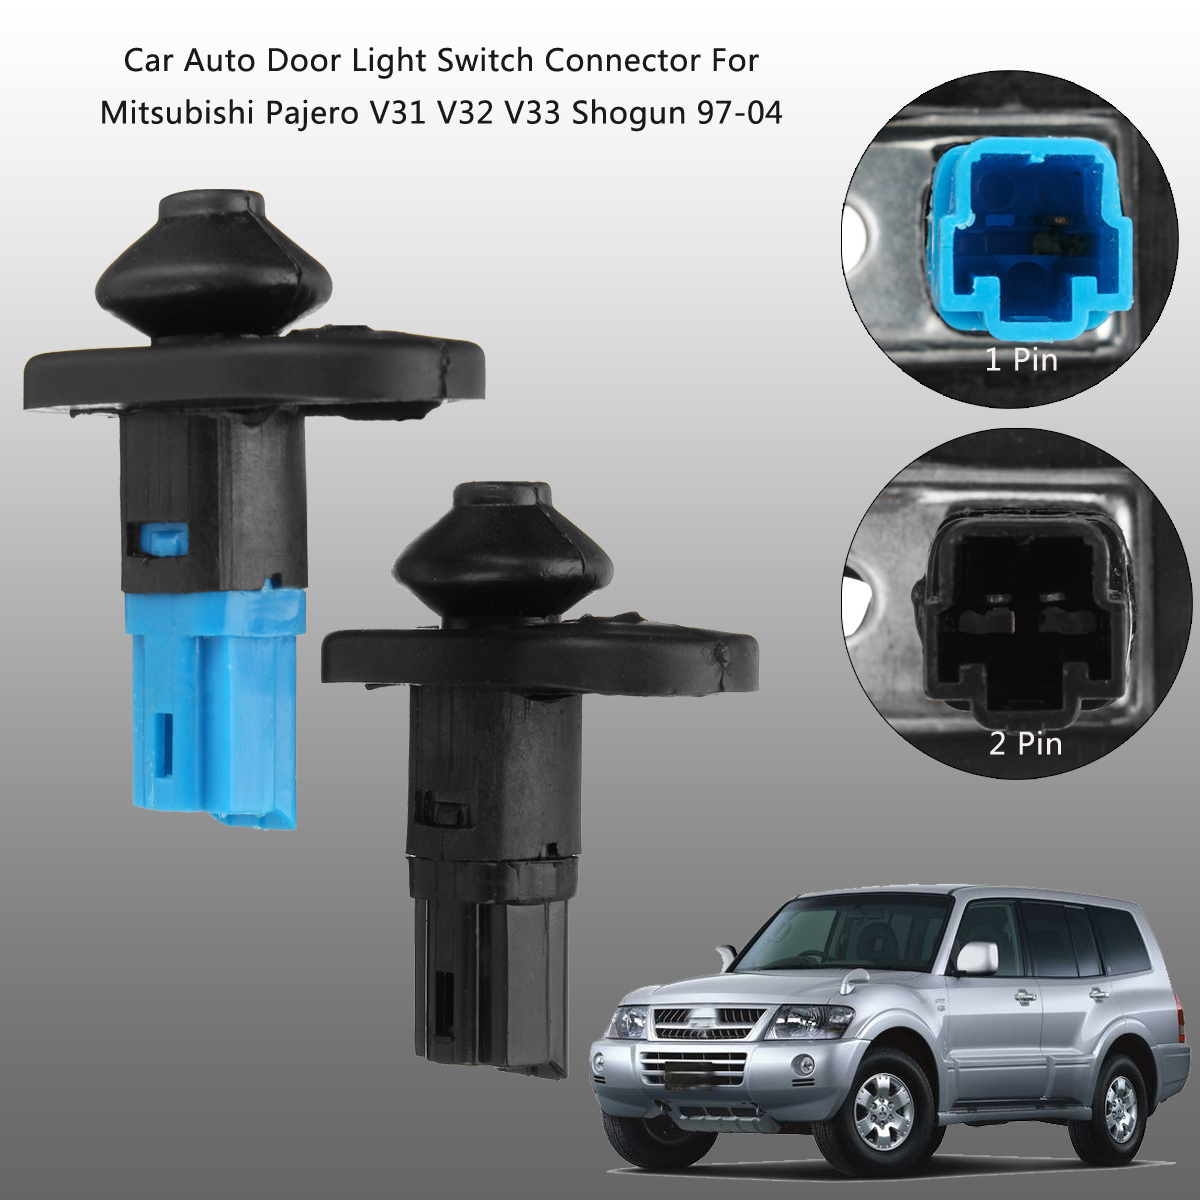 MB698713 / MB861149 Car Auto Door Light Switch for Mitsubishi Pajero V31 V32 V33 Shogun 1997-2004 Mitsubishi Pajero